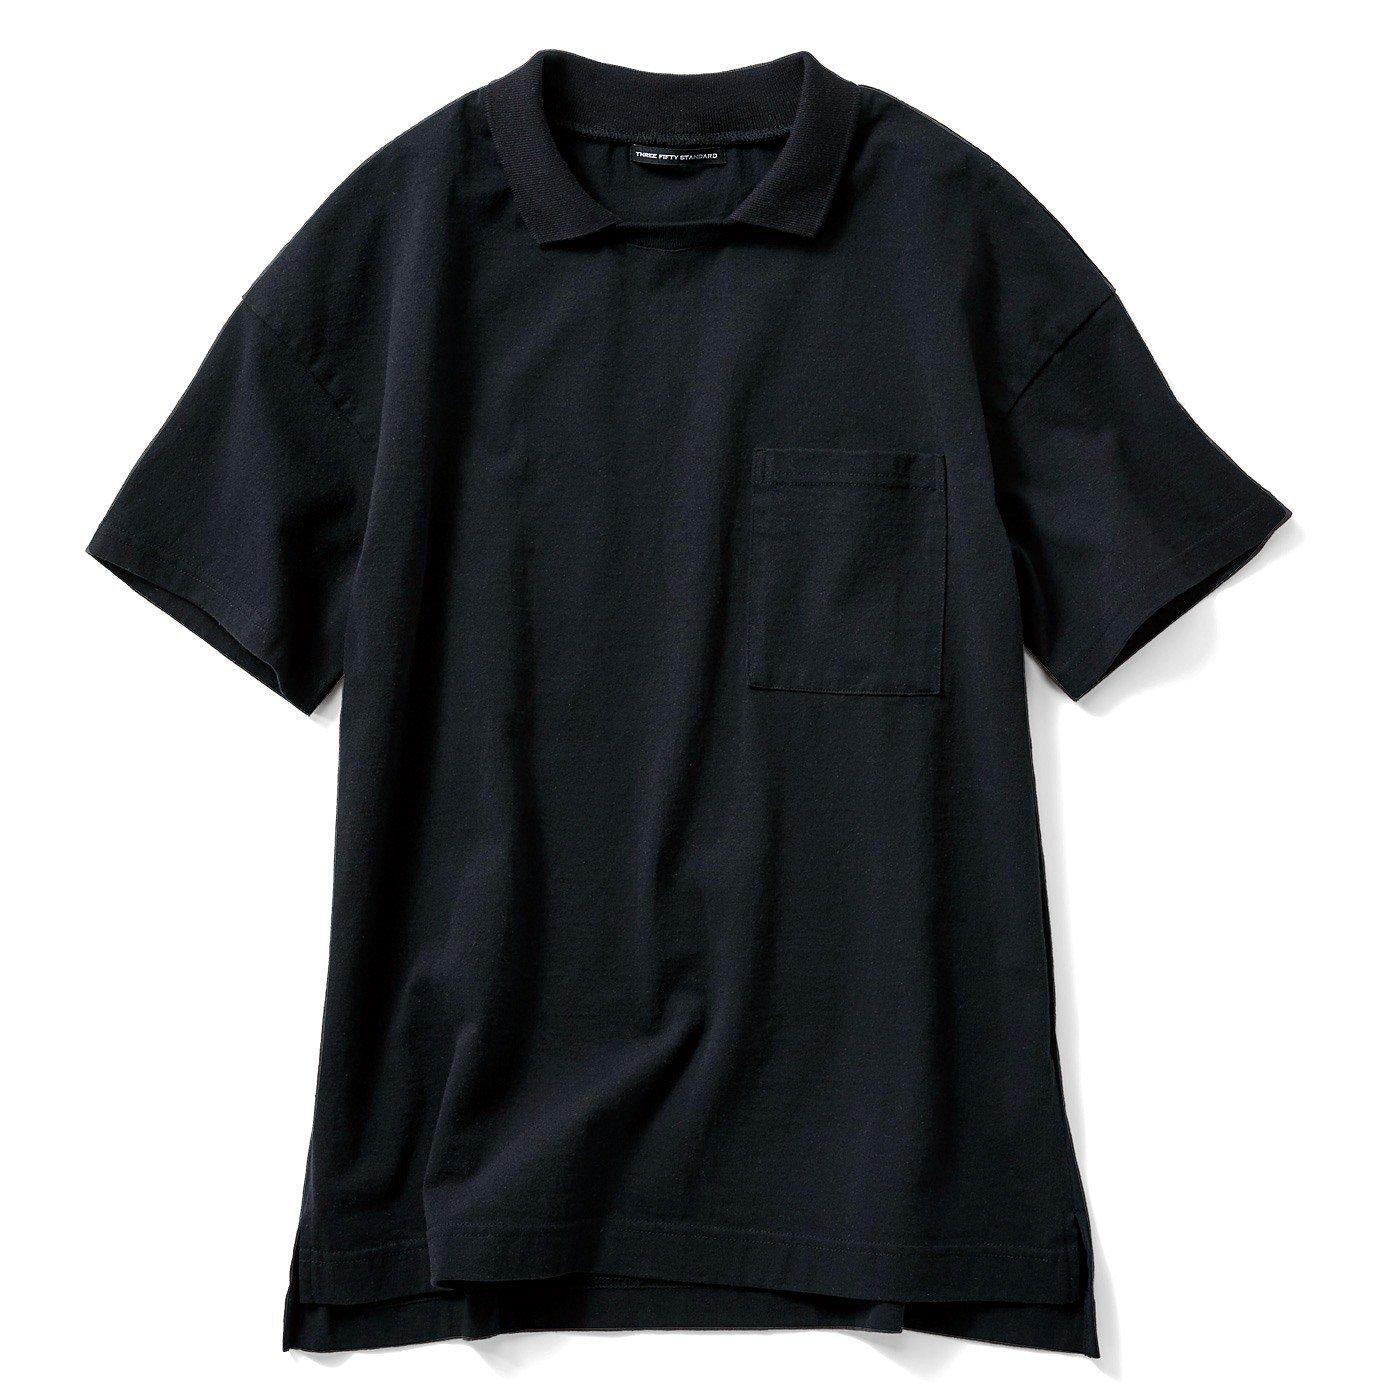 THREE FIFTY STANDARD ポロシャツみたいな衿付きスキッパーシャツ〈ブラック〉